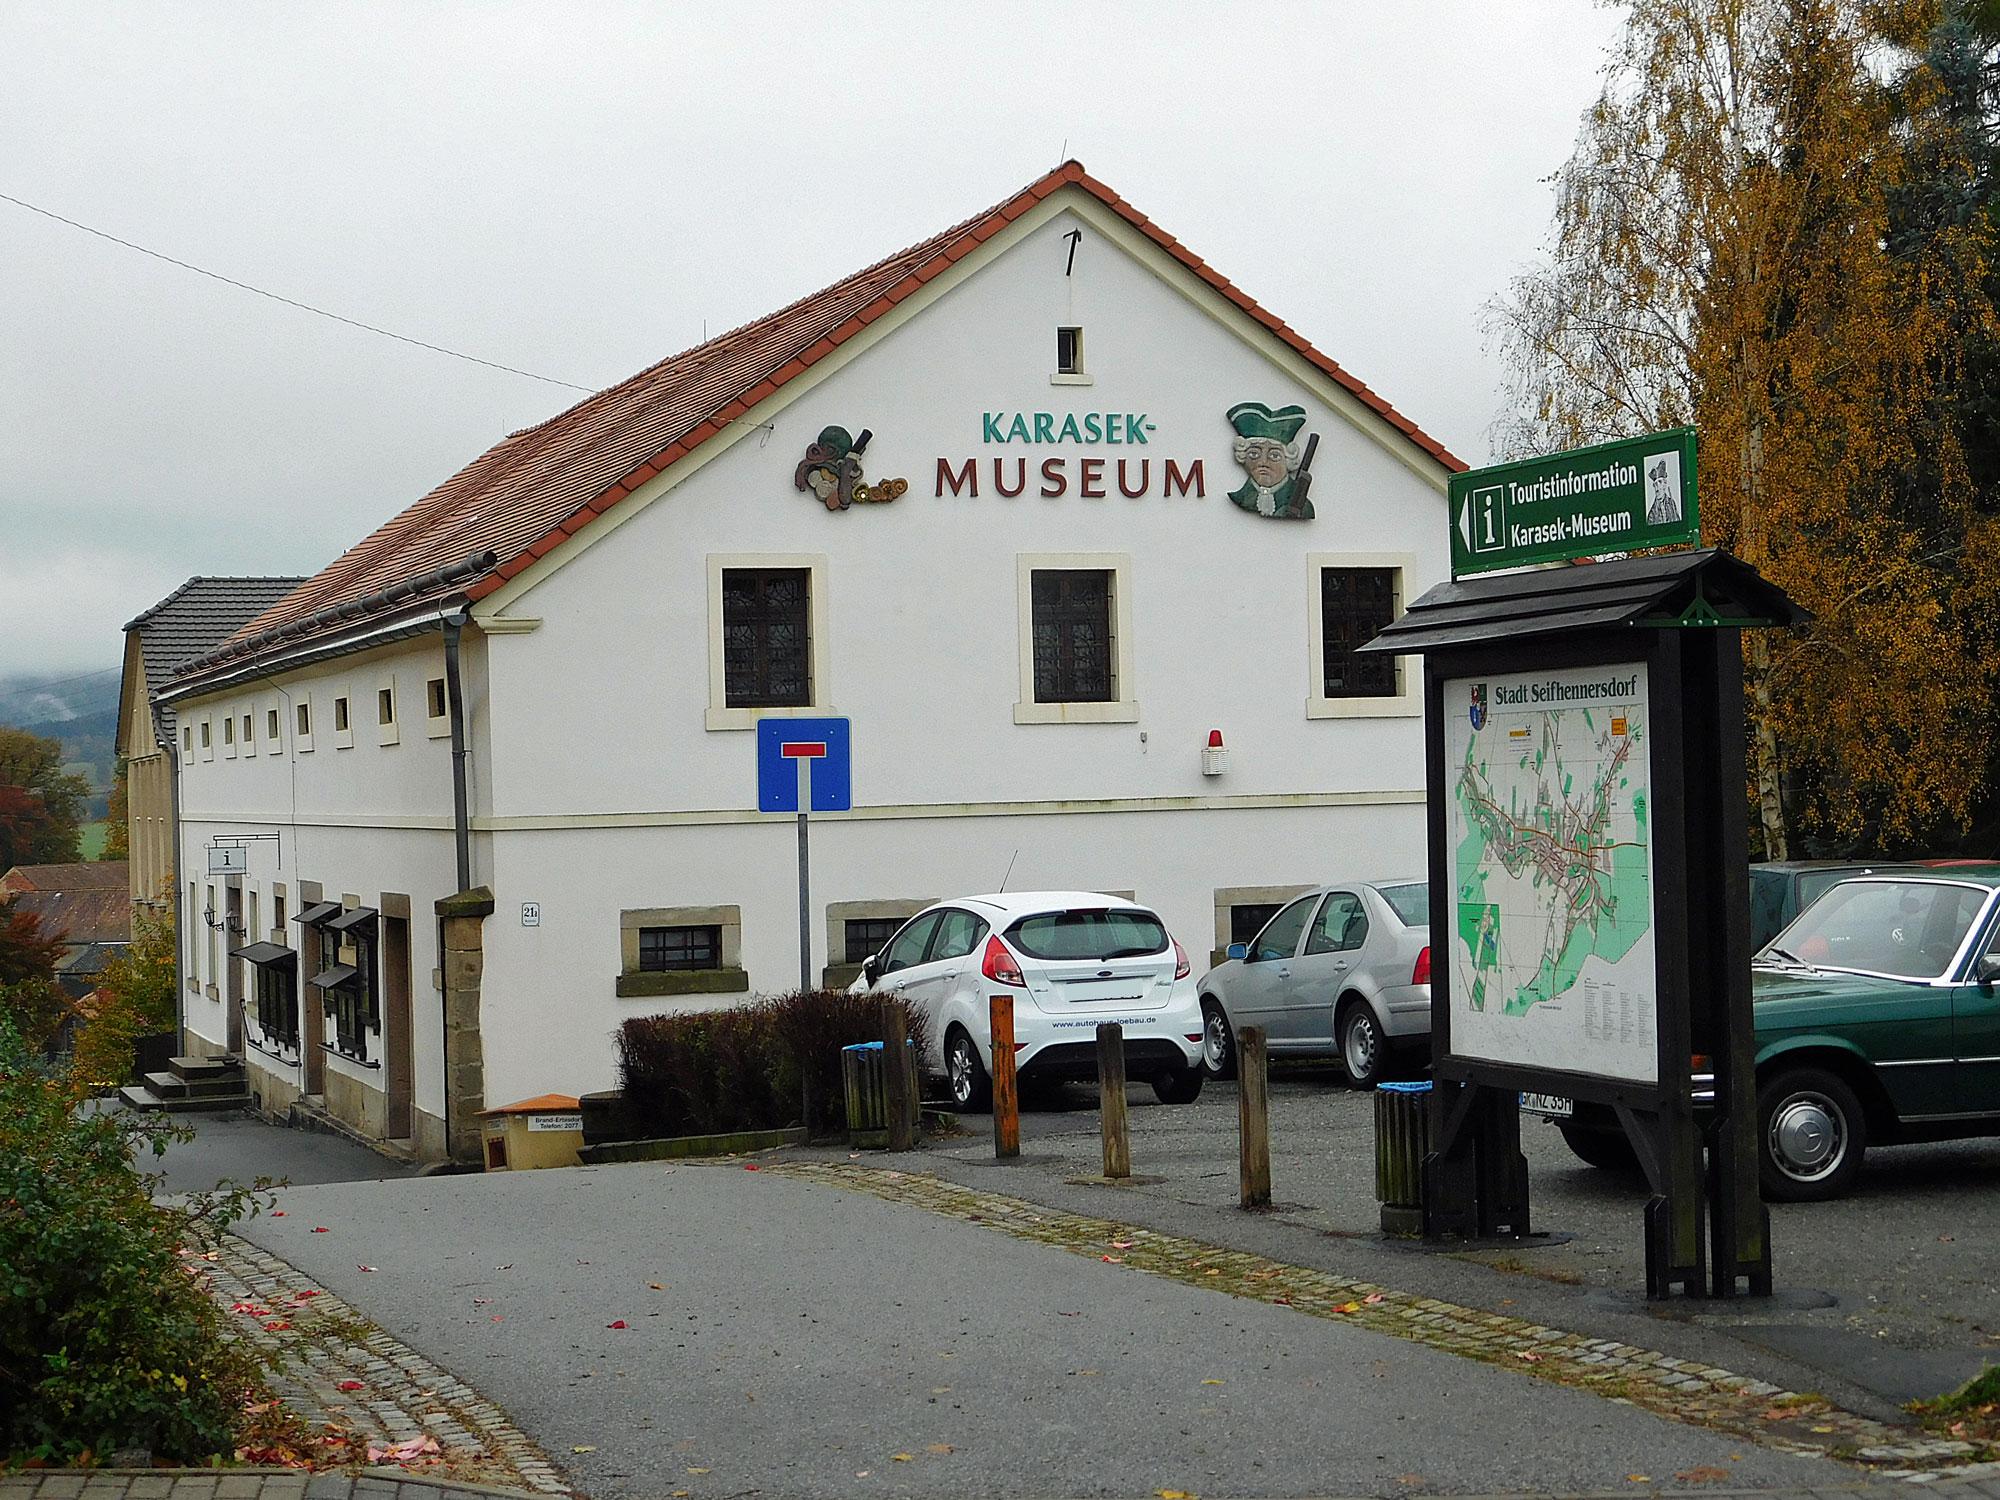 Oberlausitz Karasekmuseum